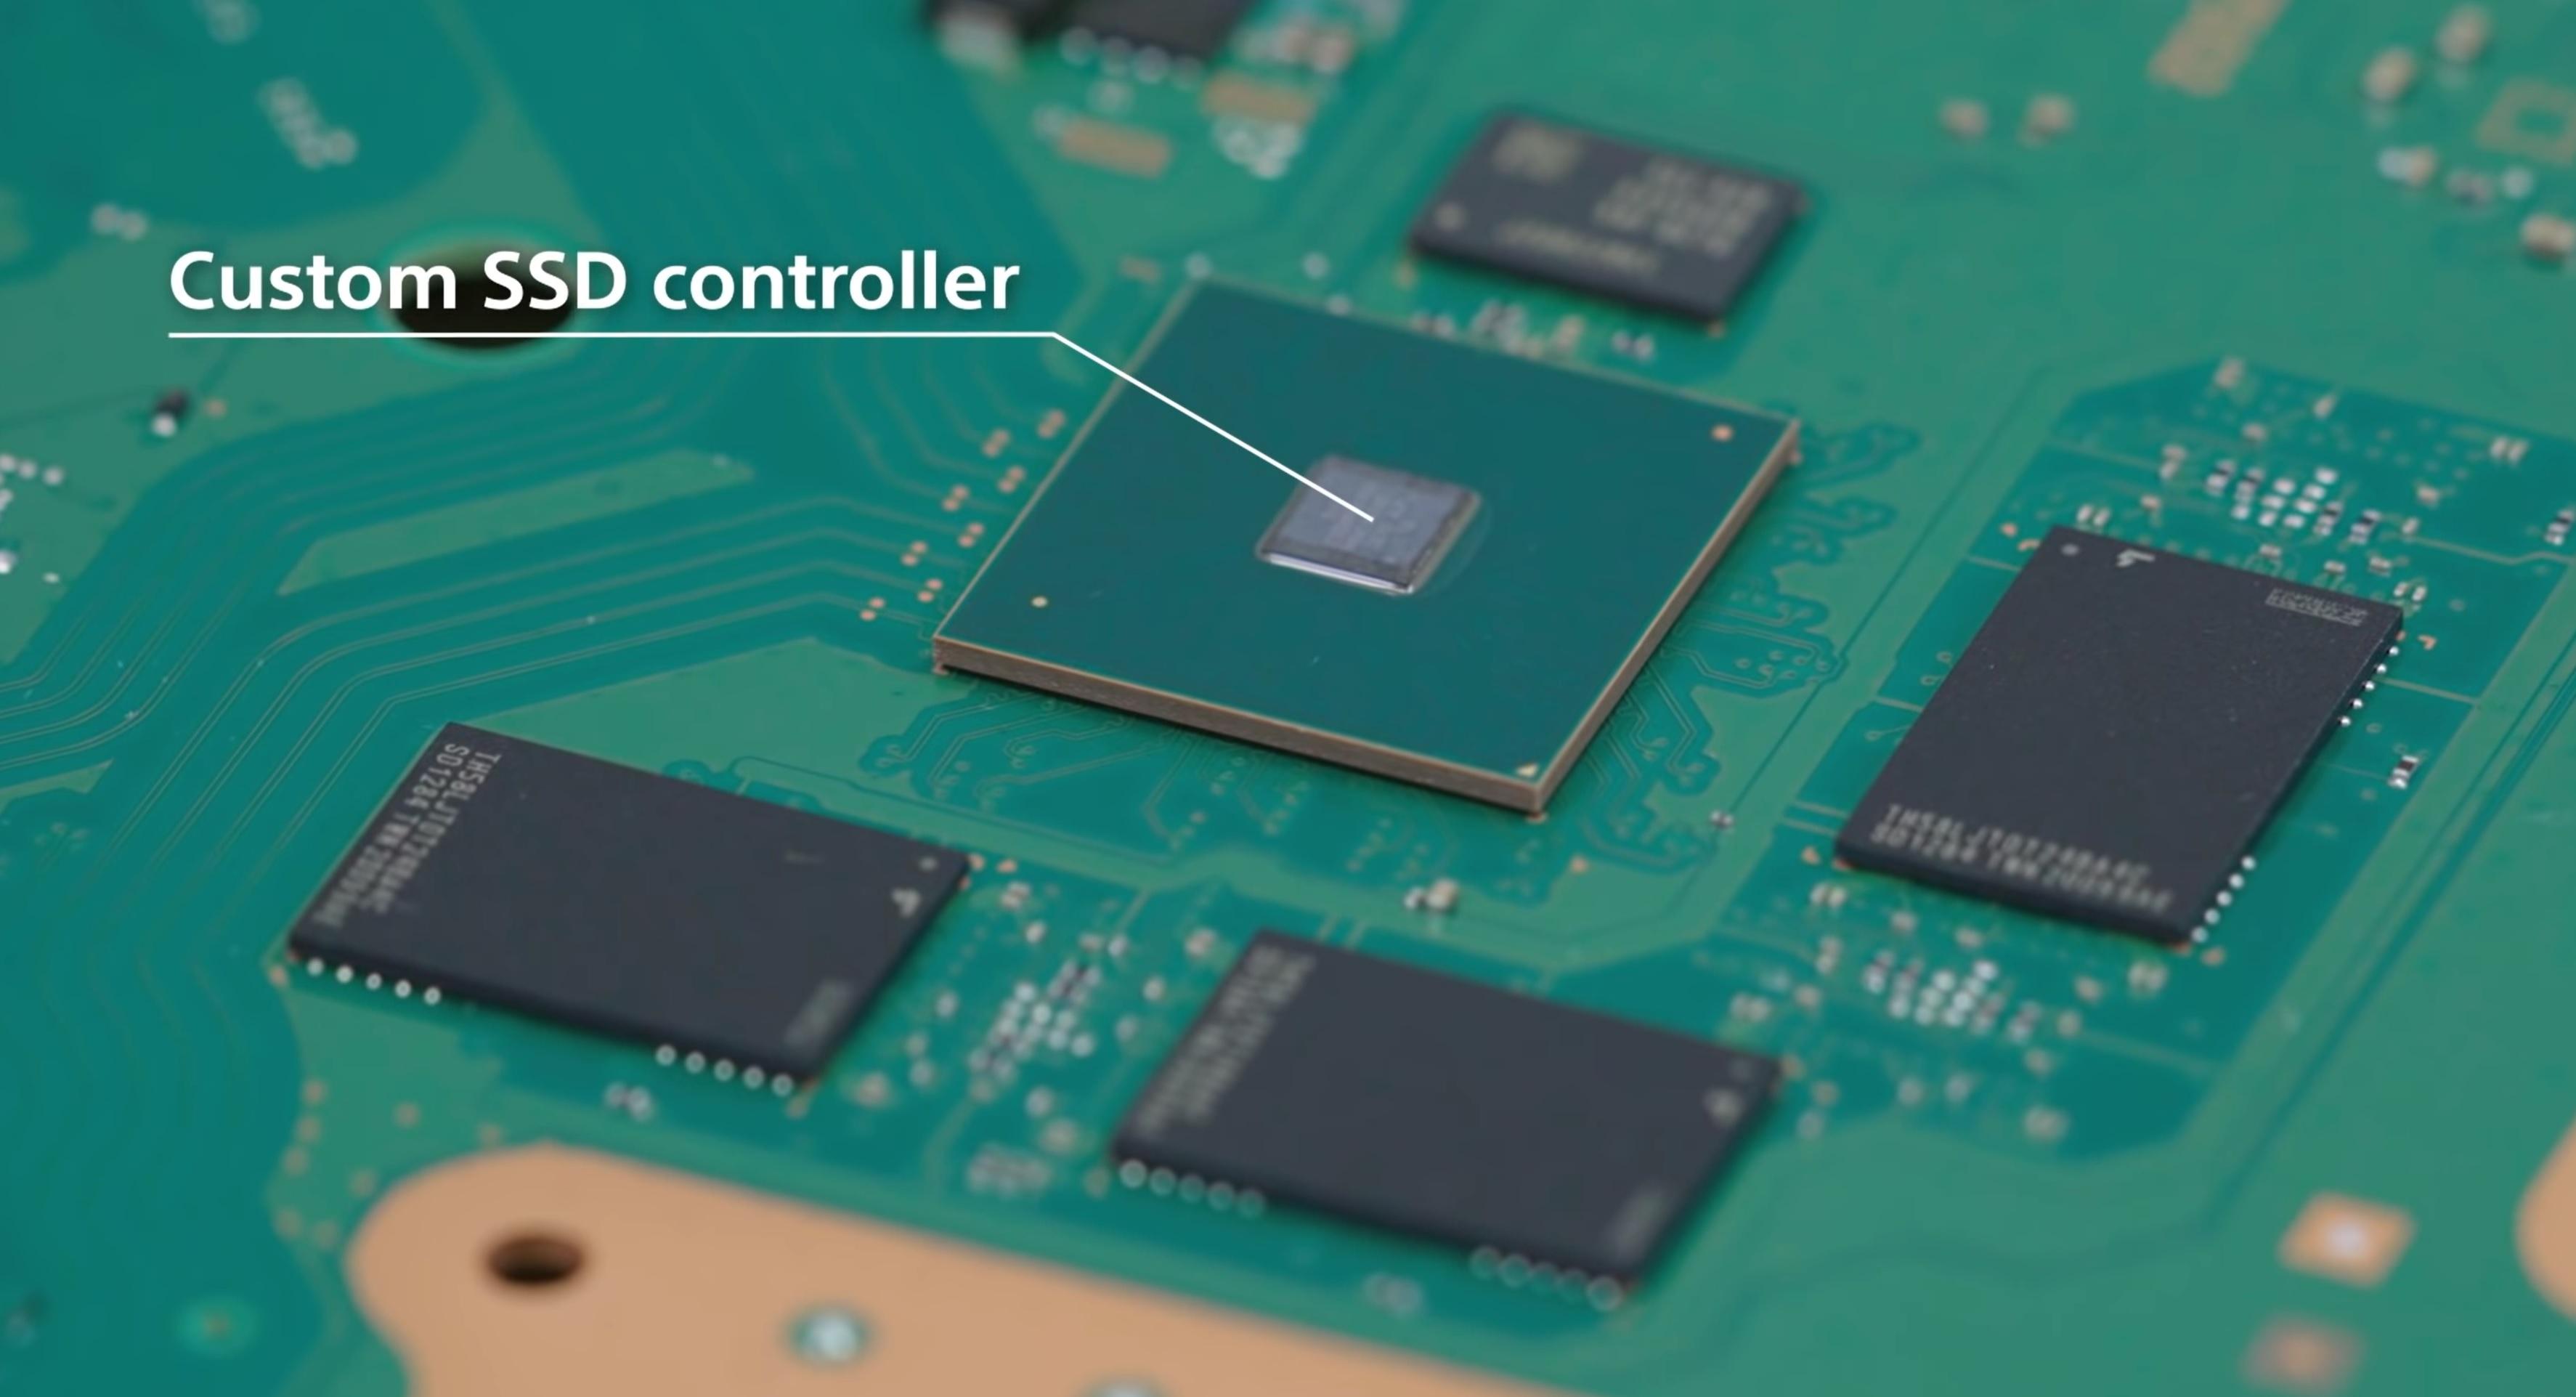 PS5 SSD Custom Controller